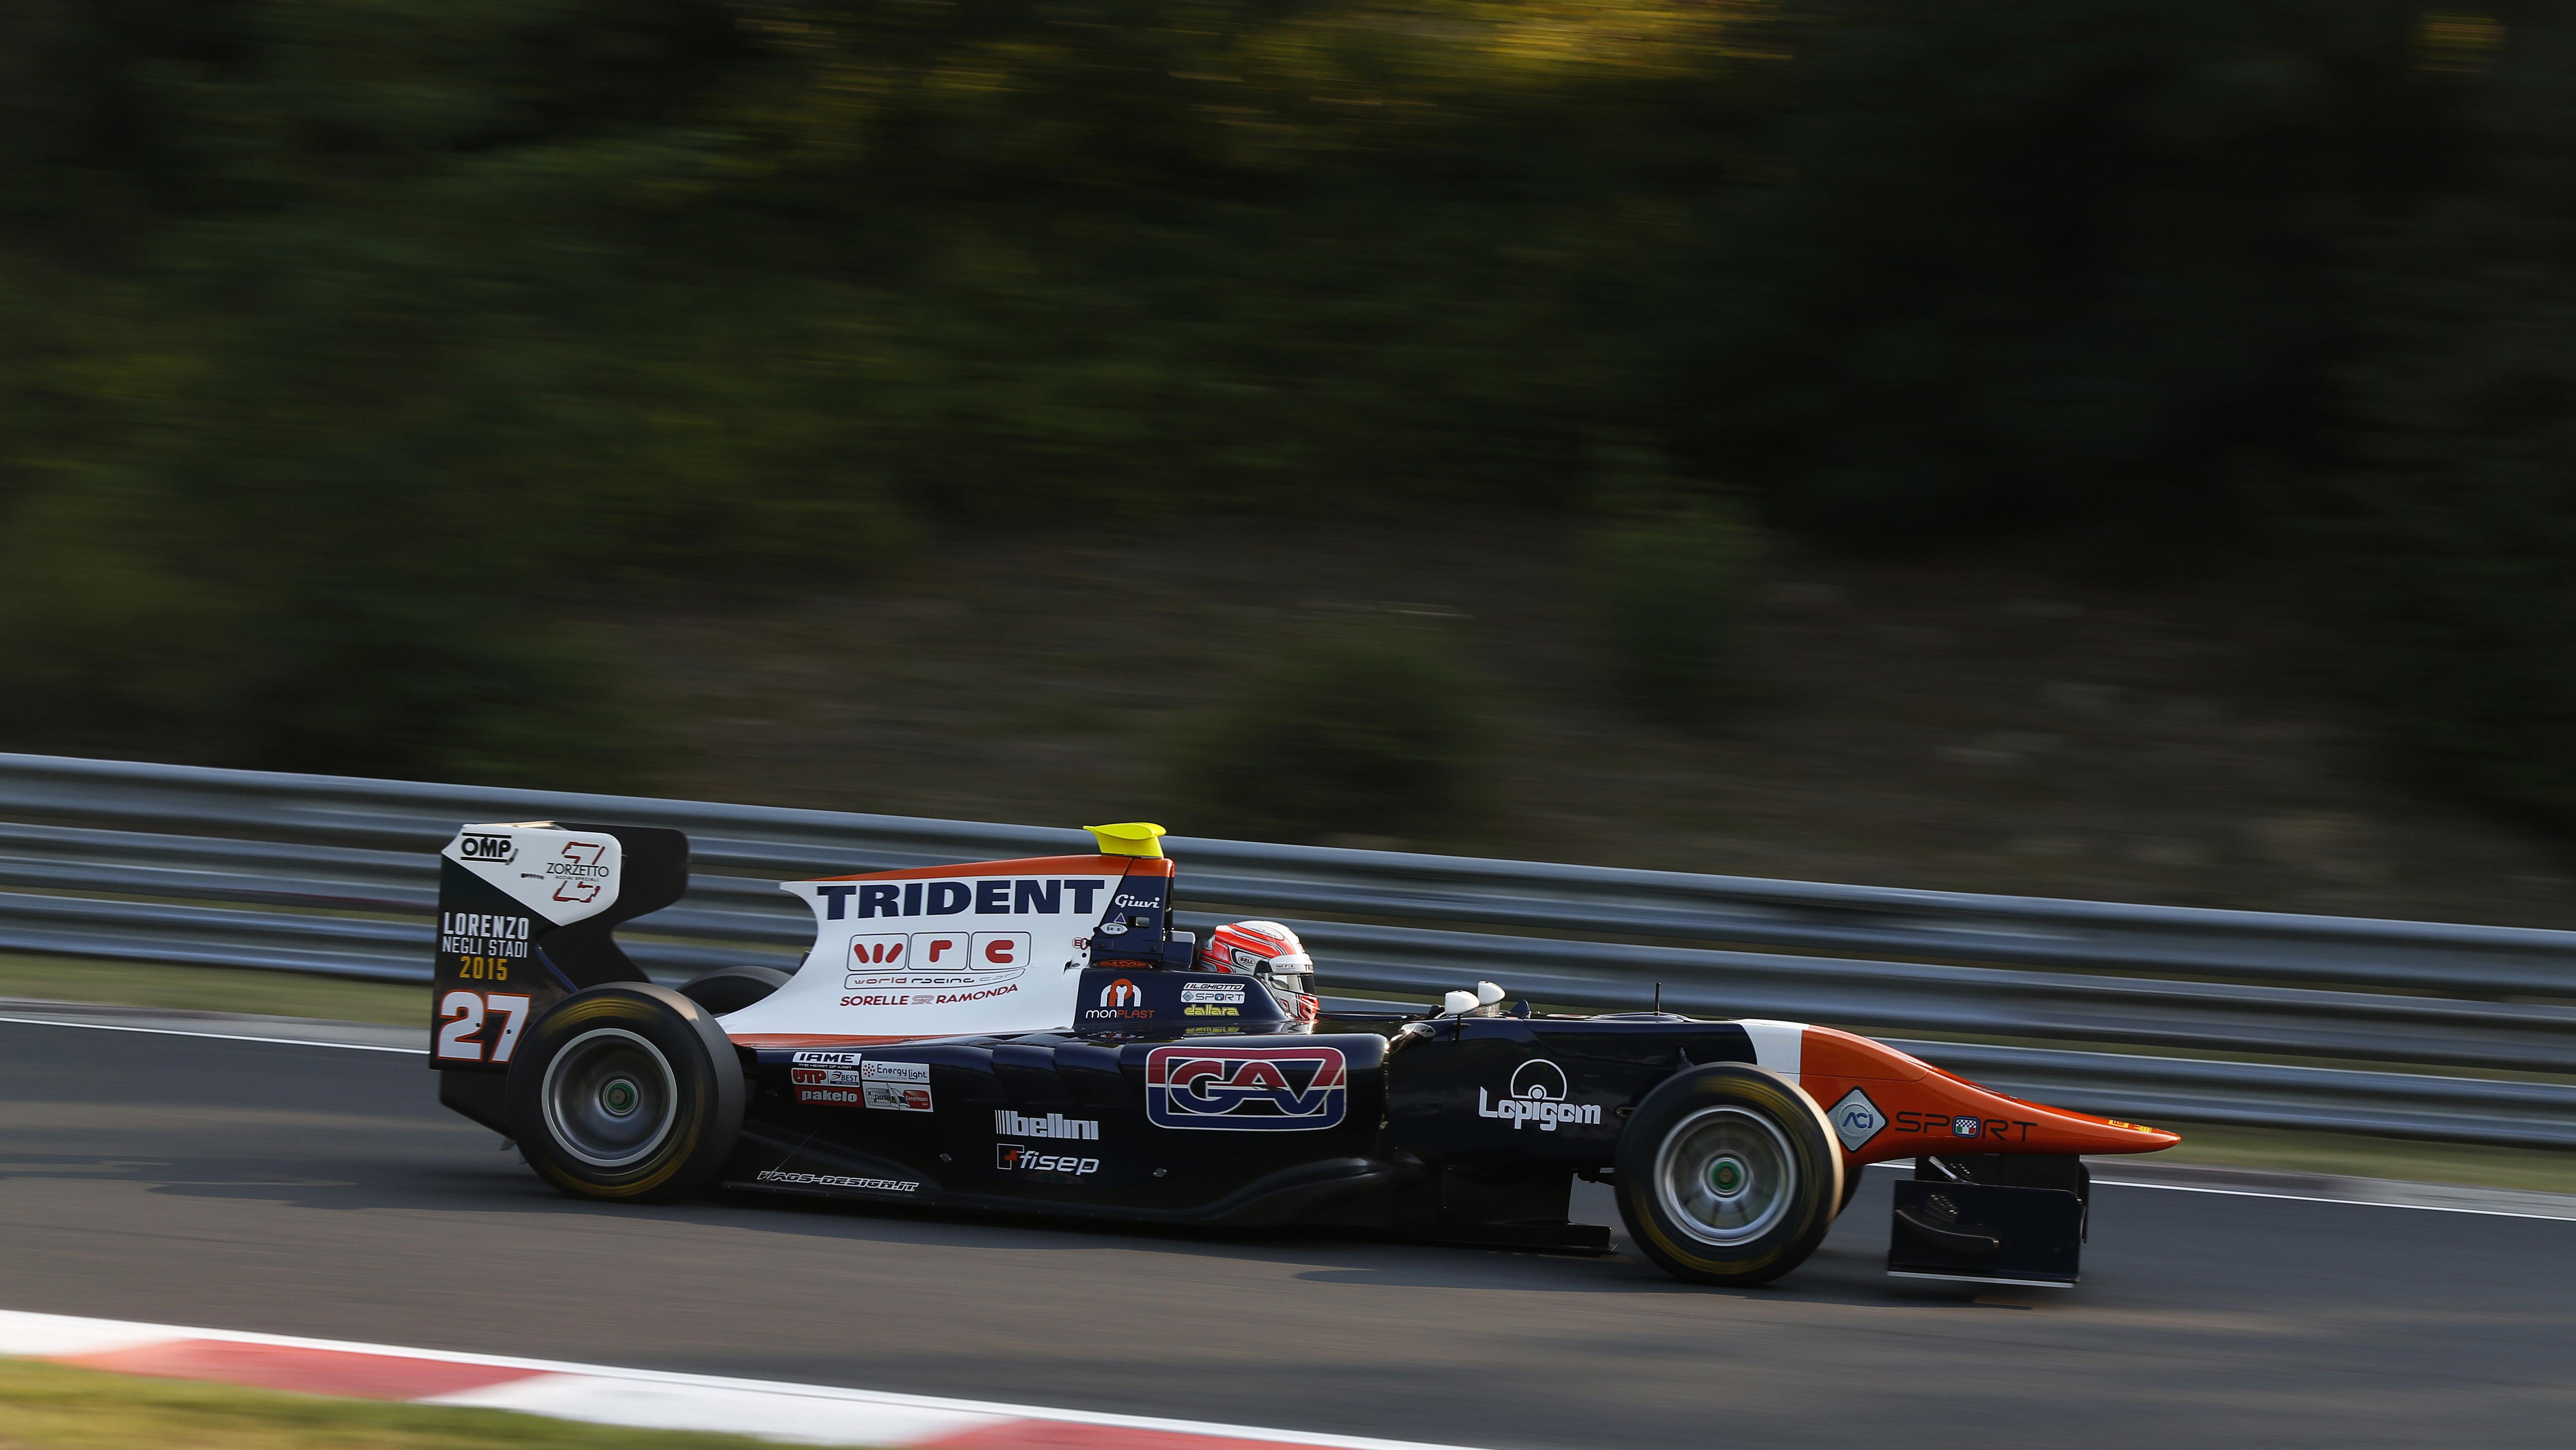 Fantastica pole position per Luca Ghiotto a Budapest